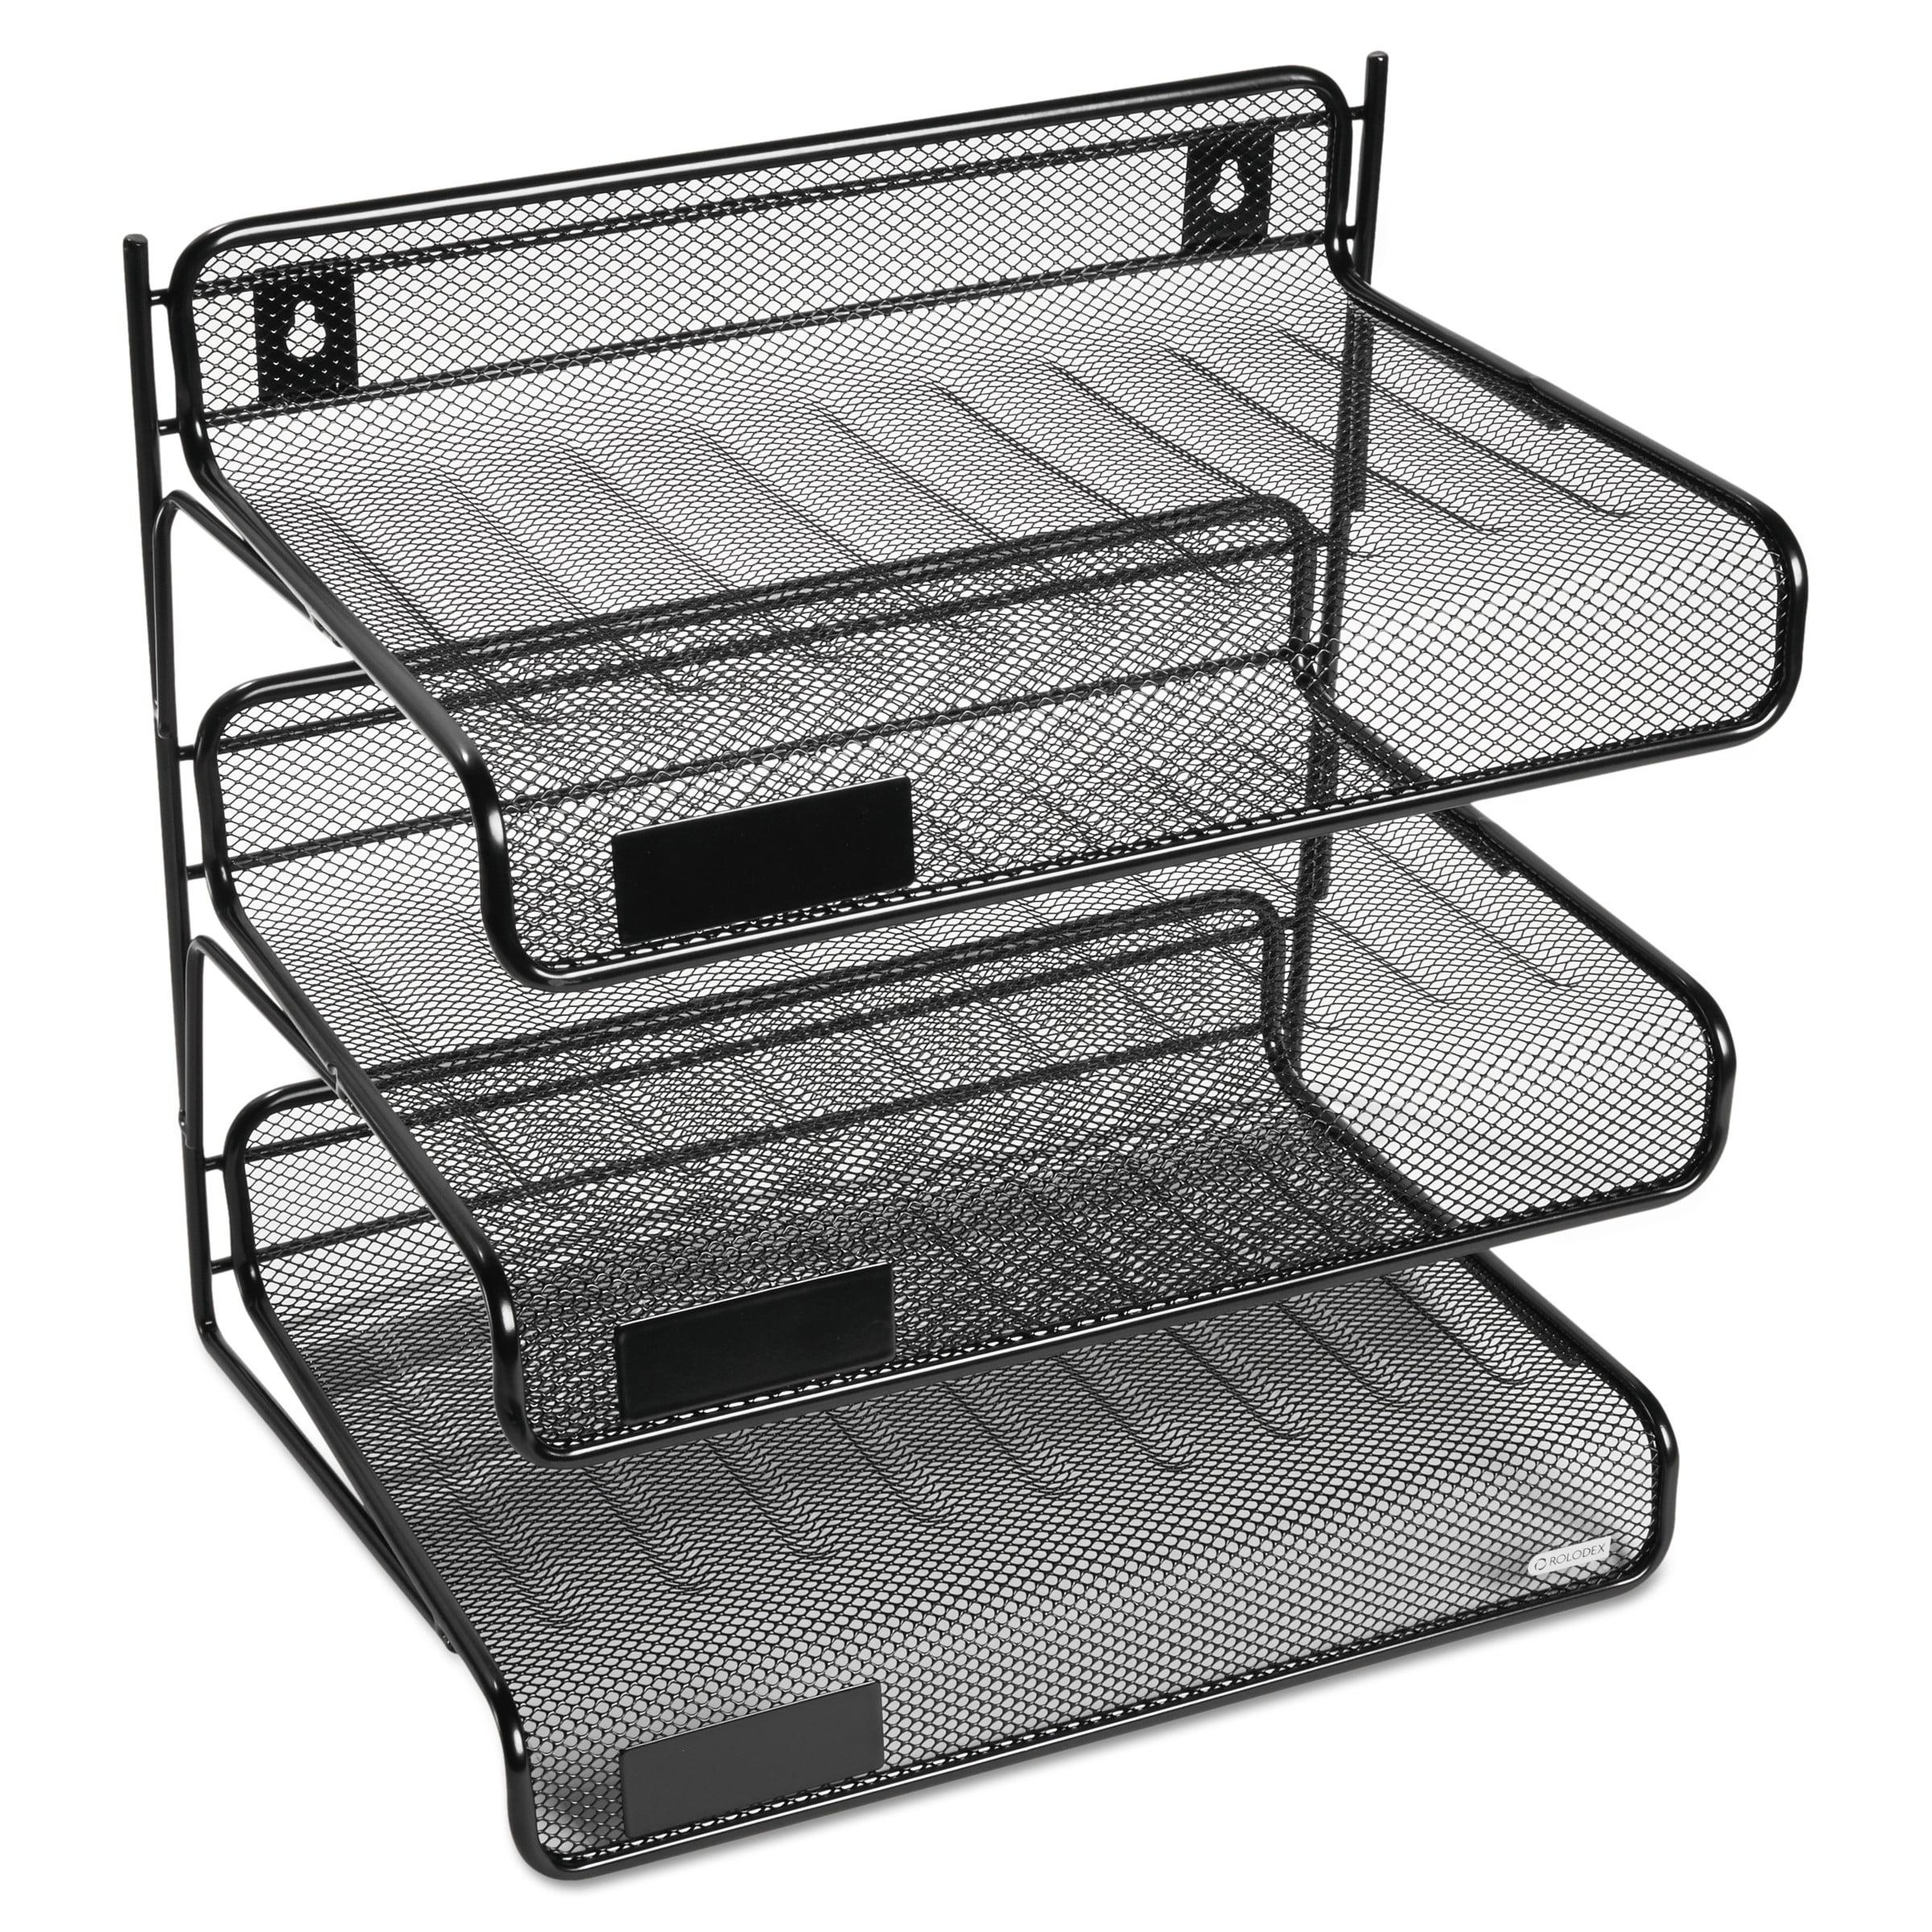 Rolodex Mesh Three-Tier Letter Size Desk Shelf, 10 x 7 x 9 3/8, Black -ROL22341